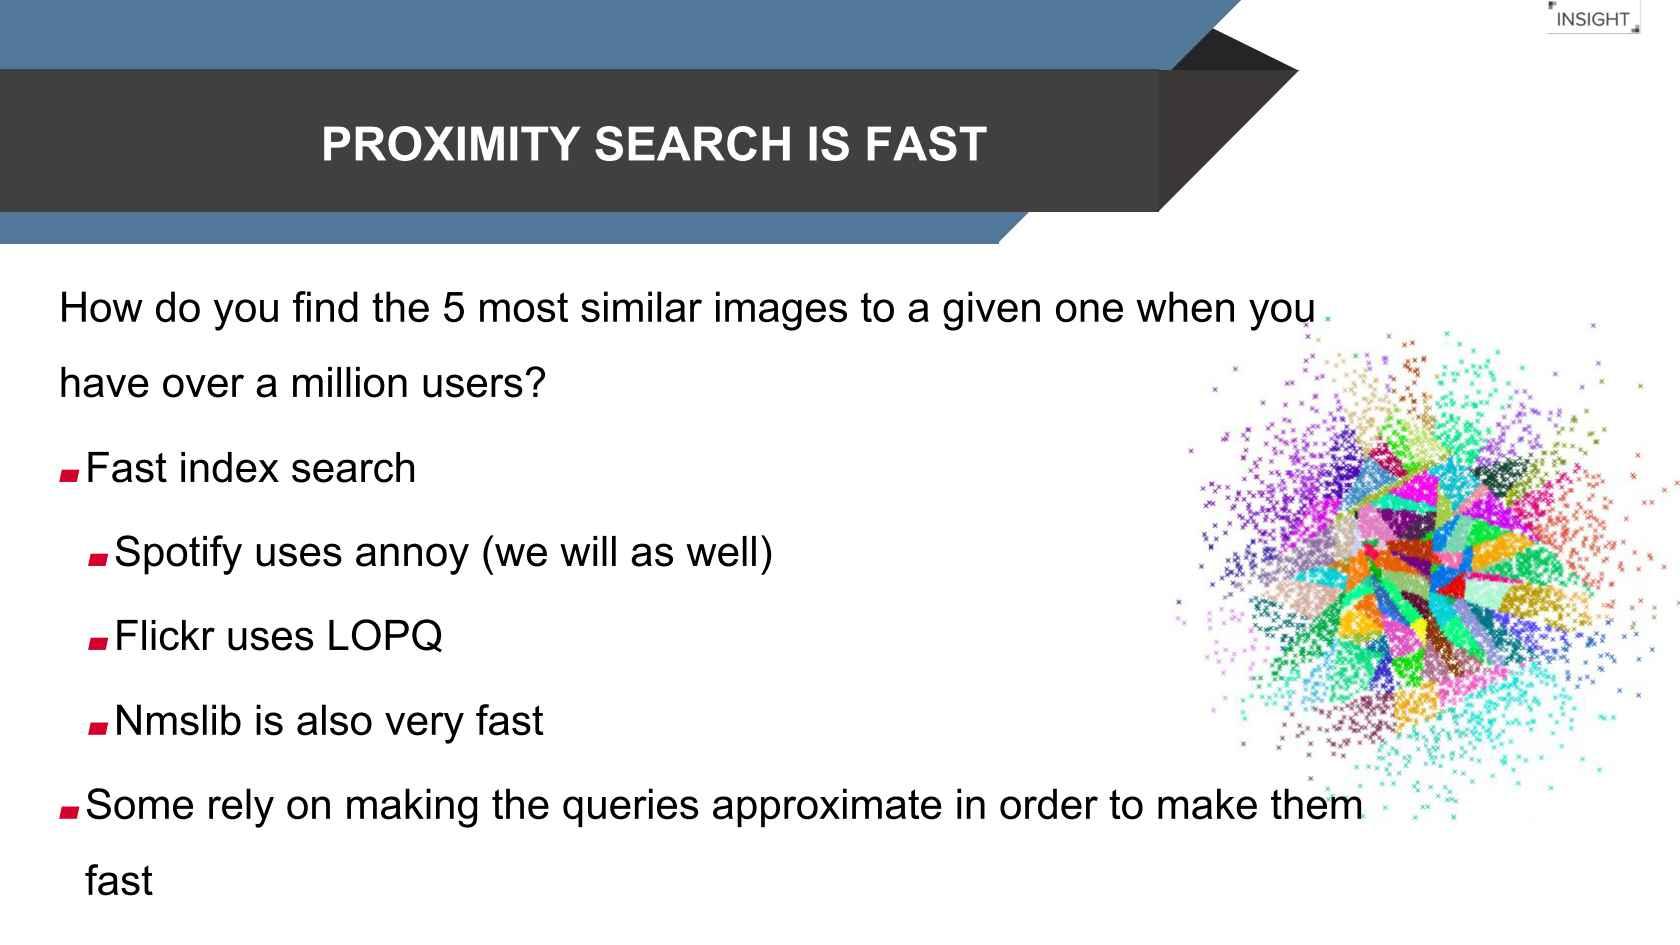 Deep Representation: Building a Semantic Image Search Engine